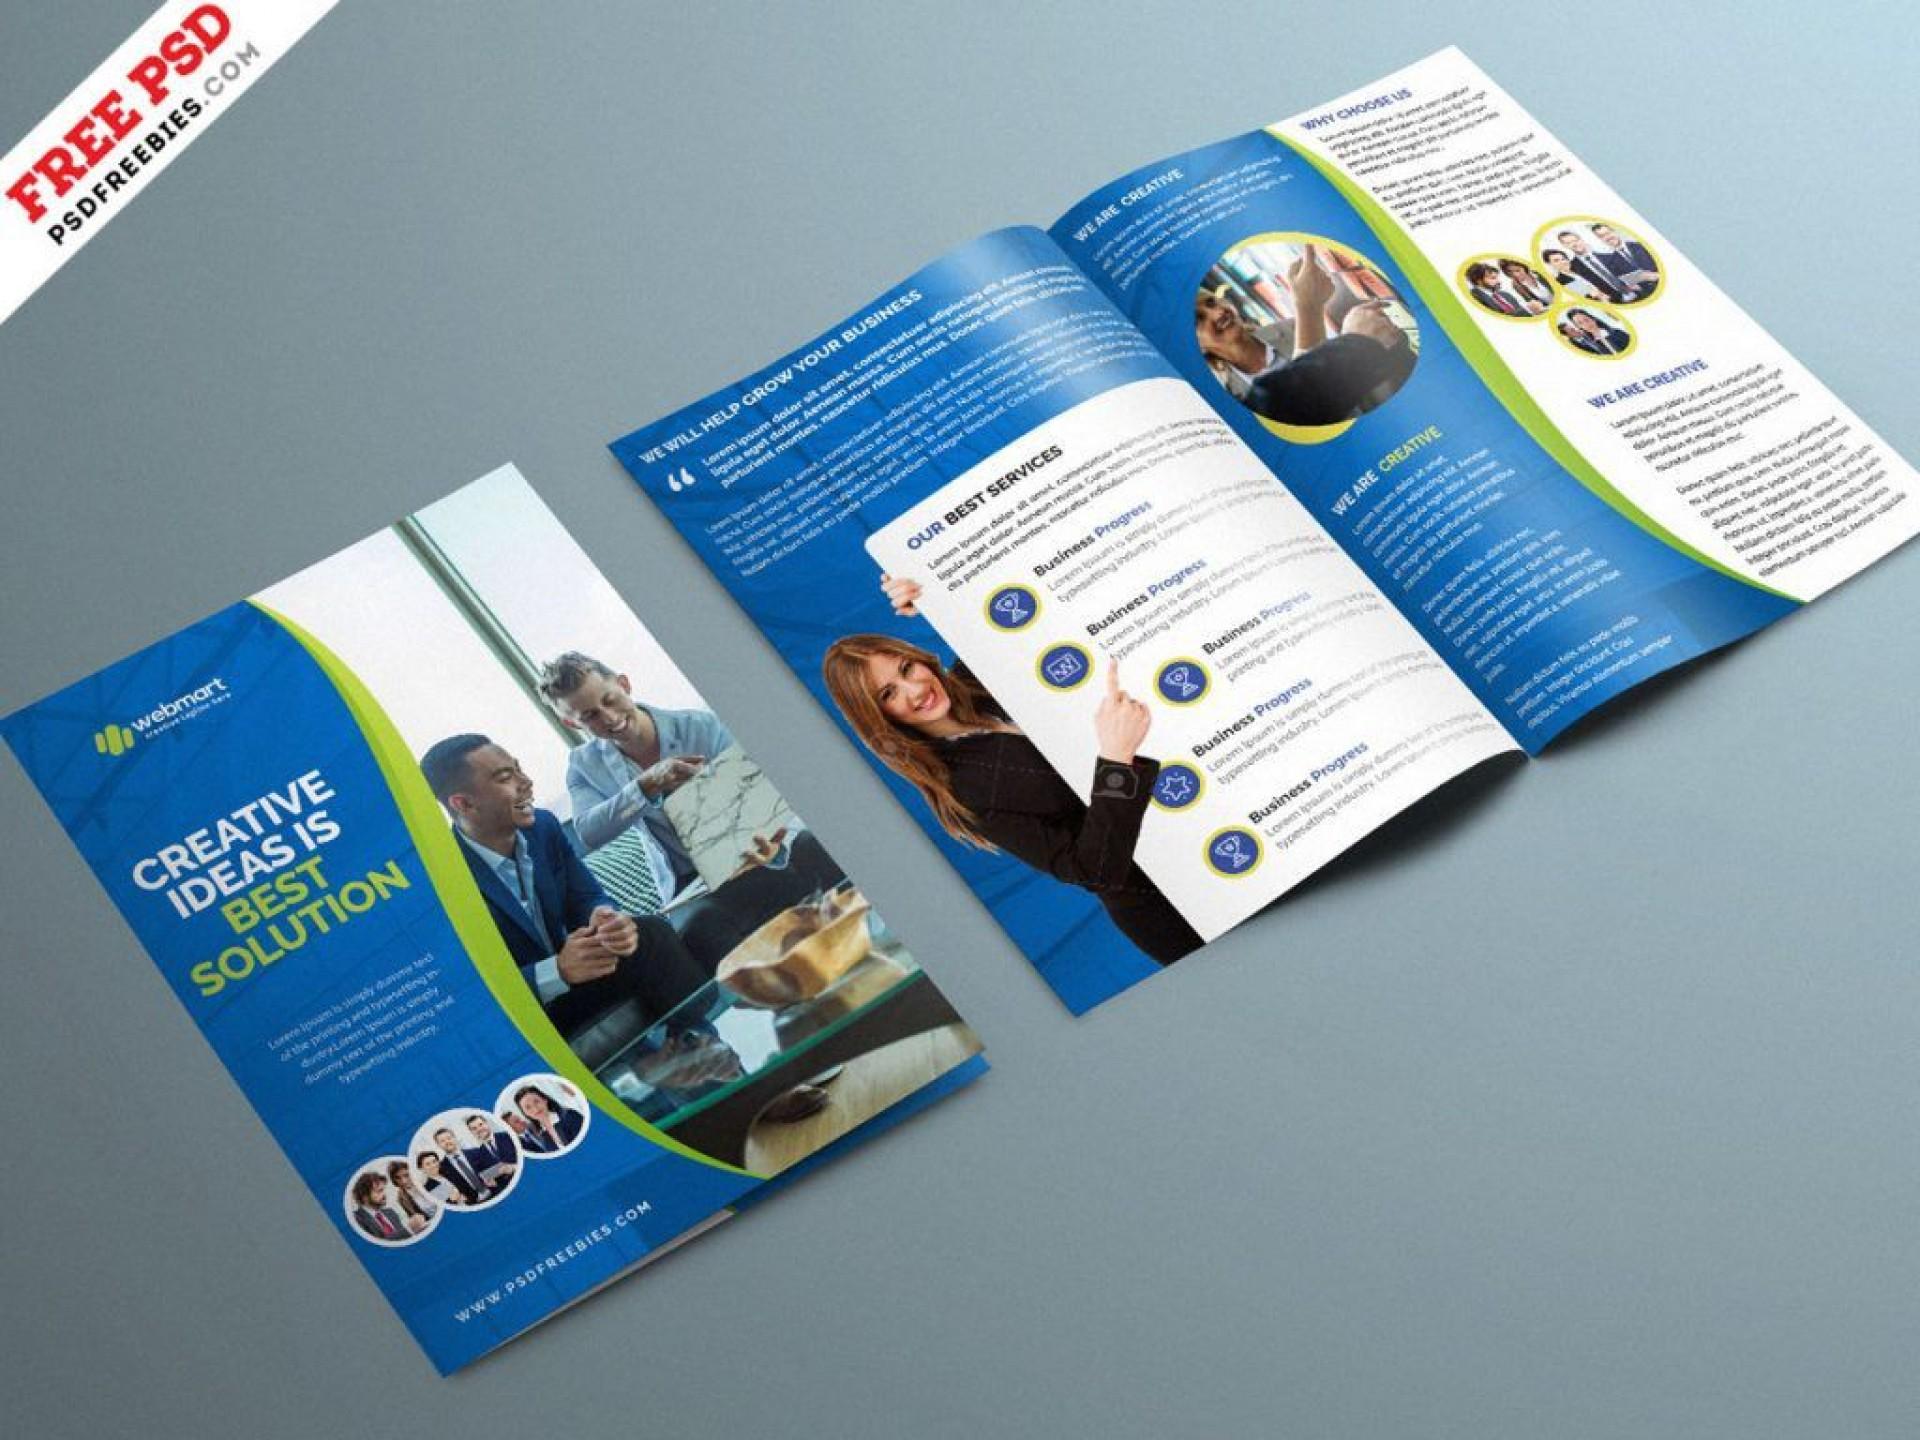 004 Unusual Corporate Brochure Design Template Psd Free Download Example  Tri Fold Hotel1920